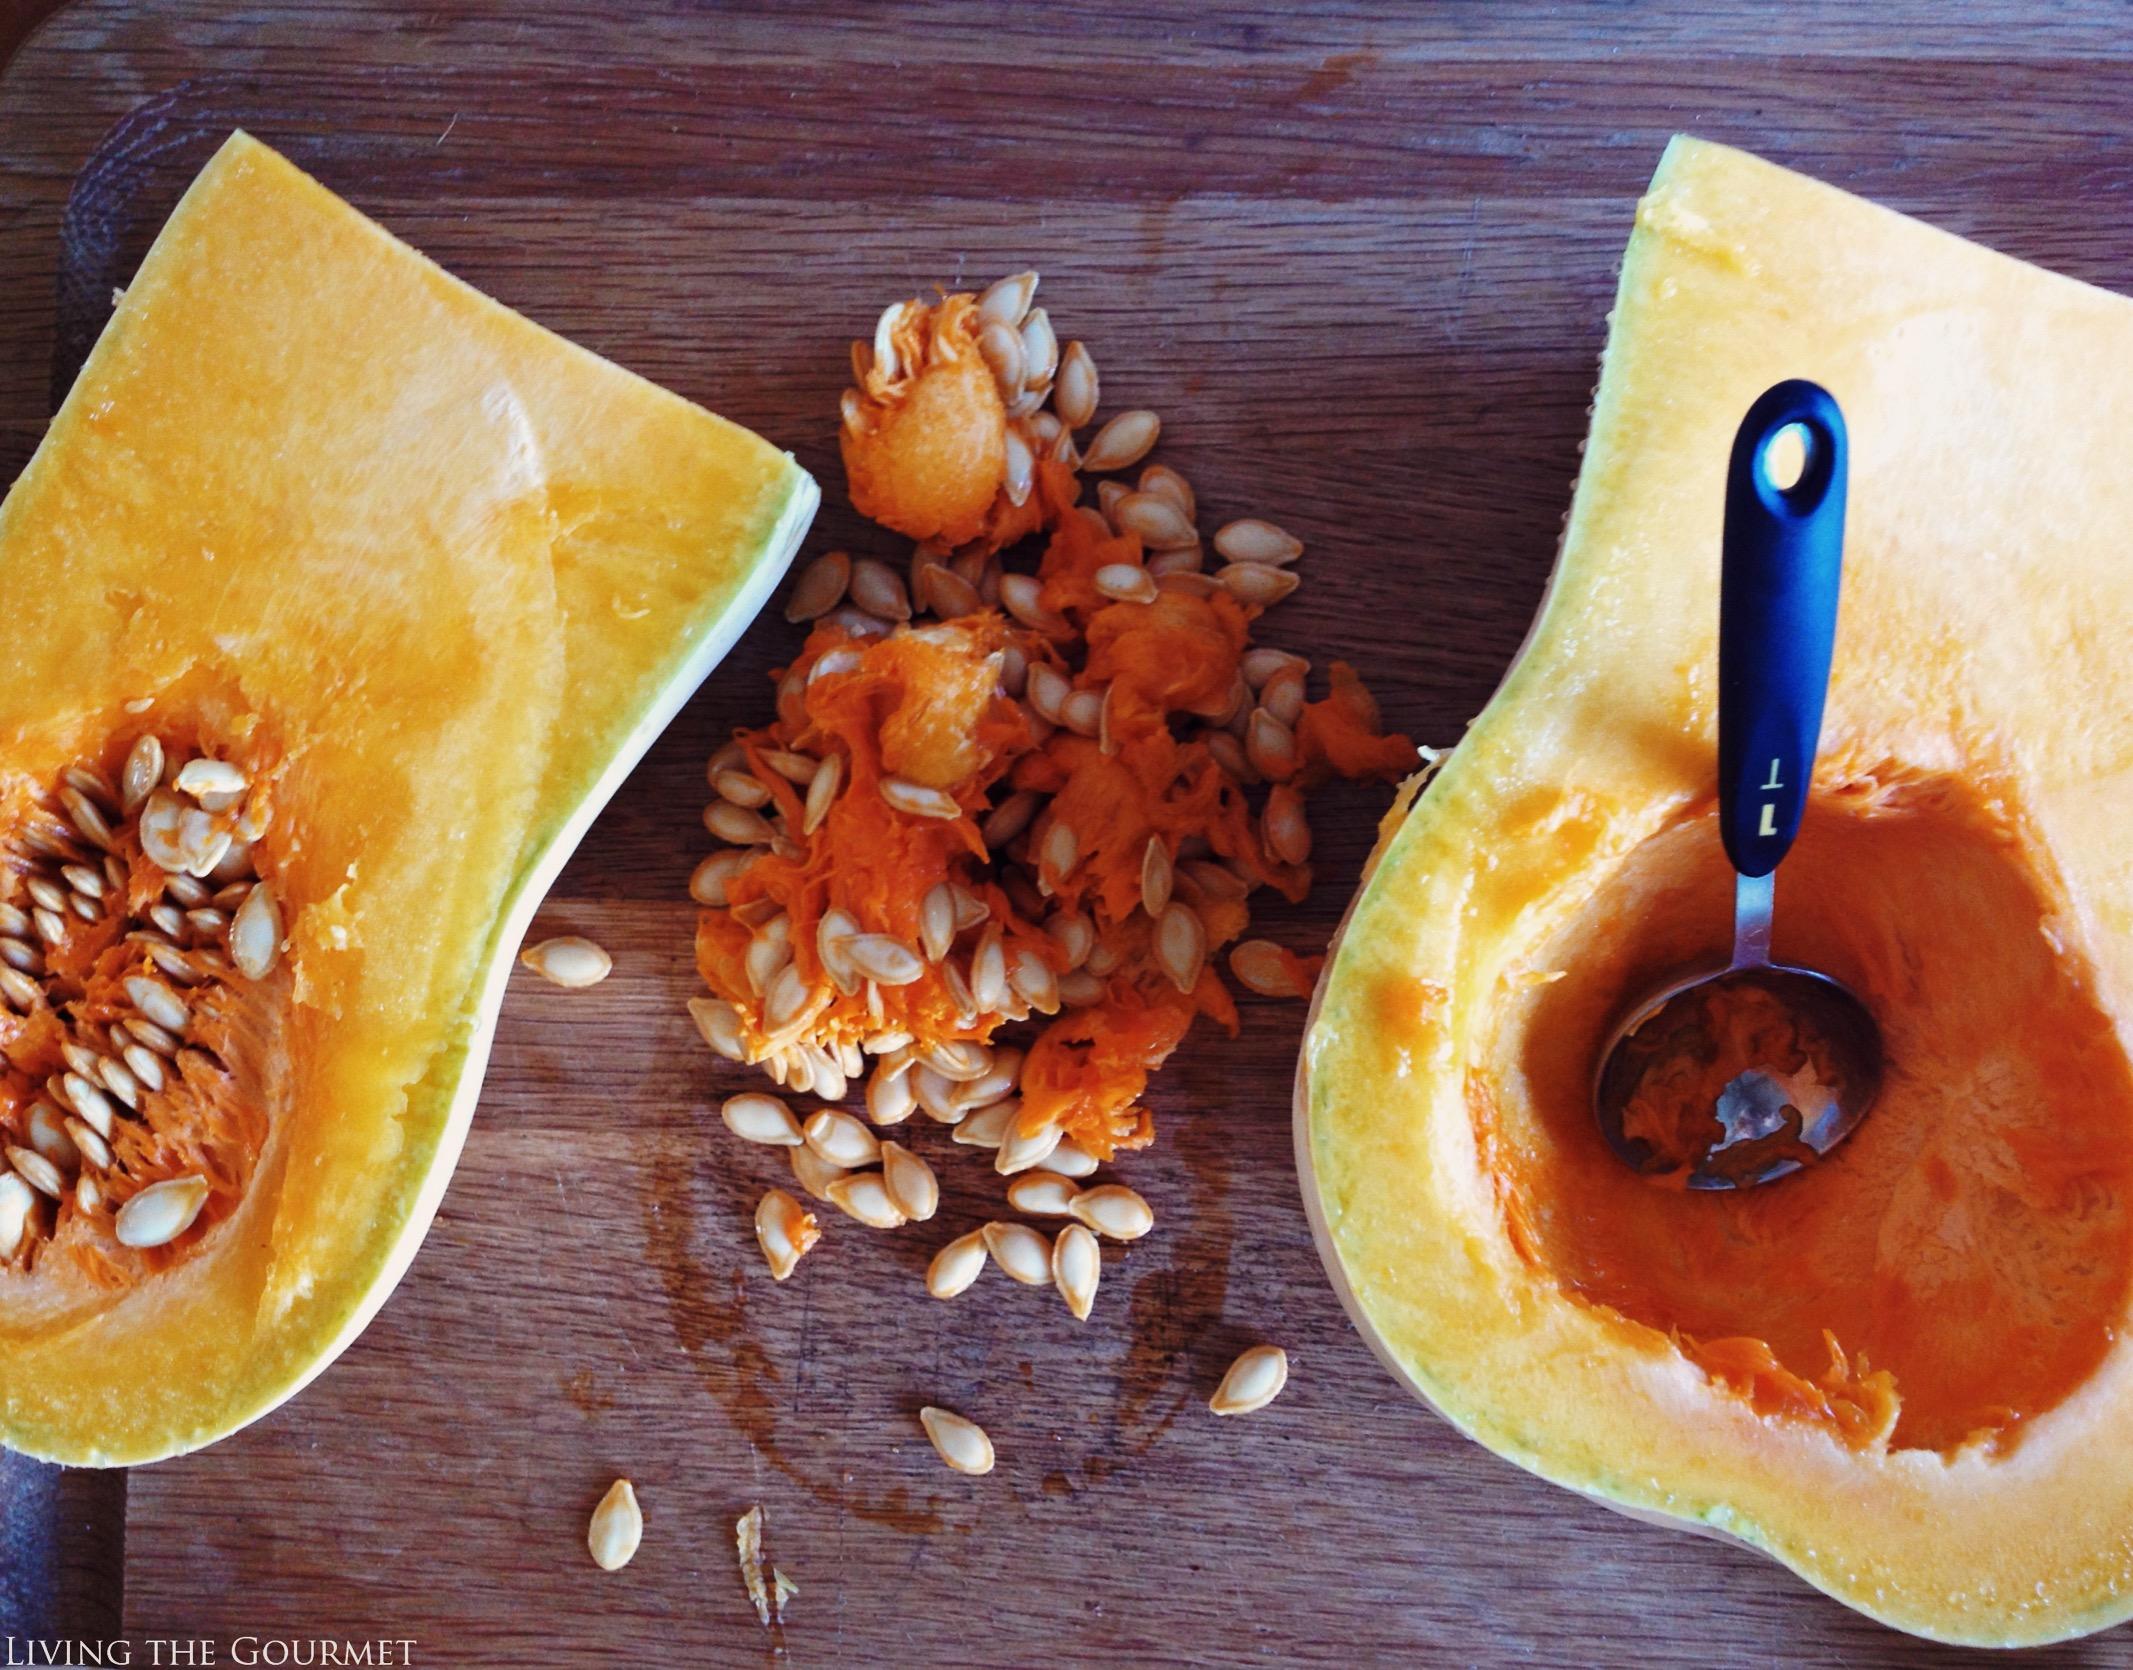 Living the Gourmet: Cinnamon Maple Gold Roasted Butternut Squash